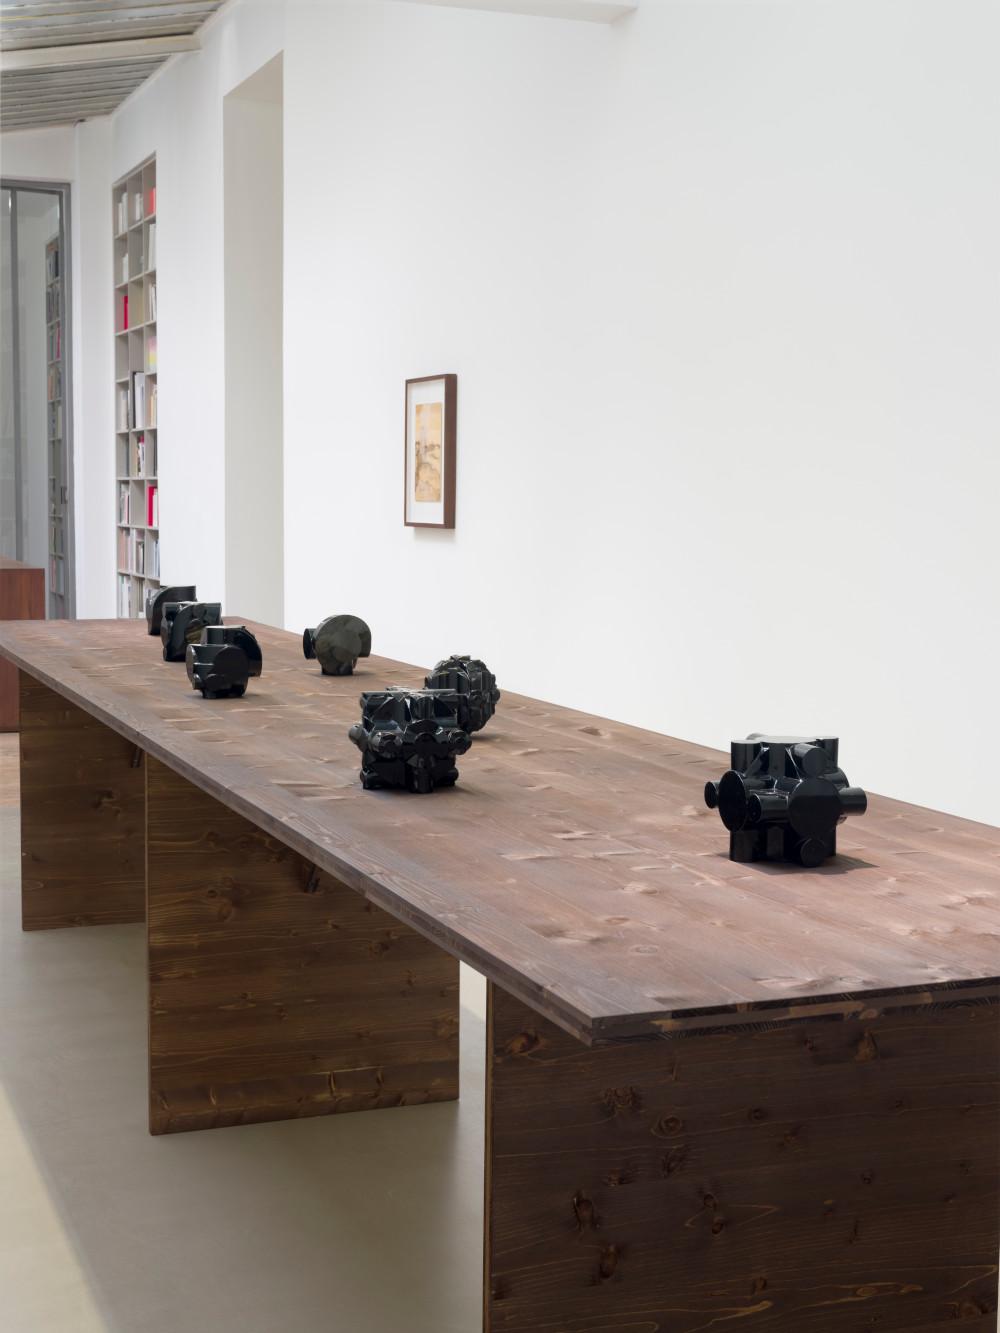 Galerie Chantal Crousel Gabriel Orozco 7